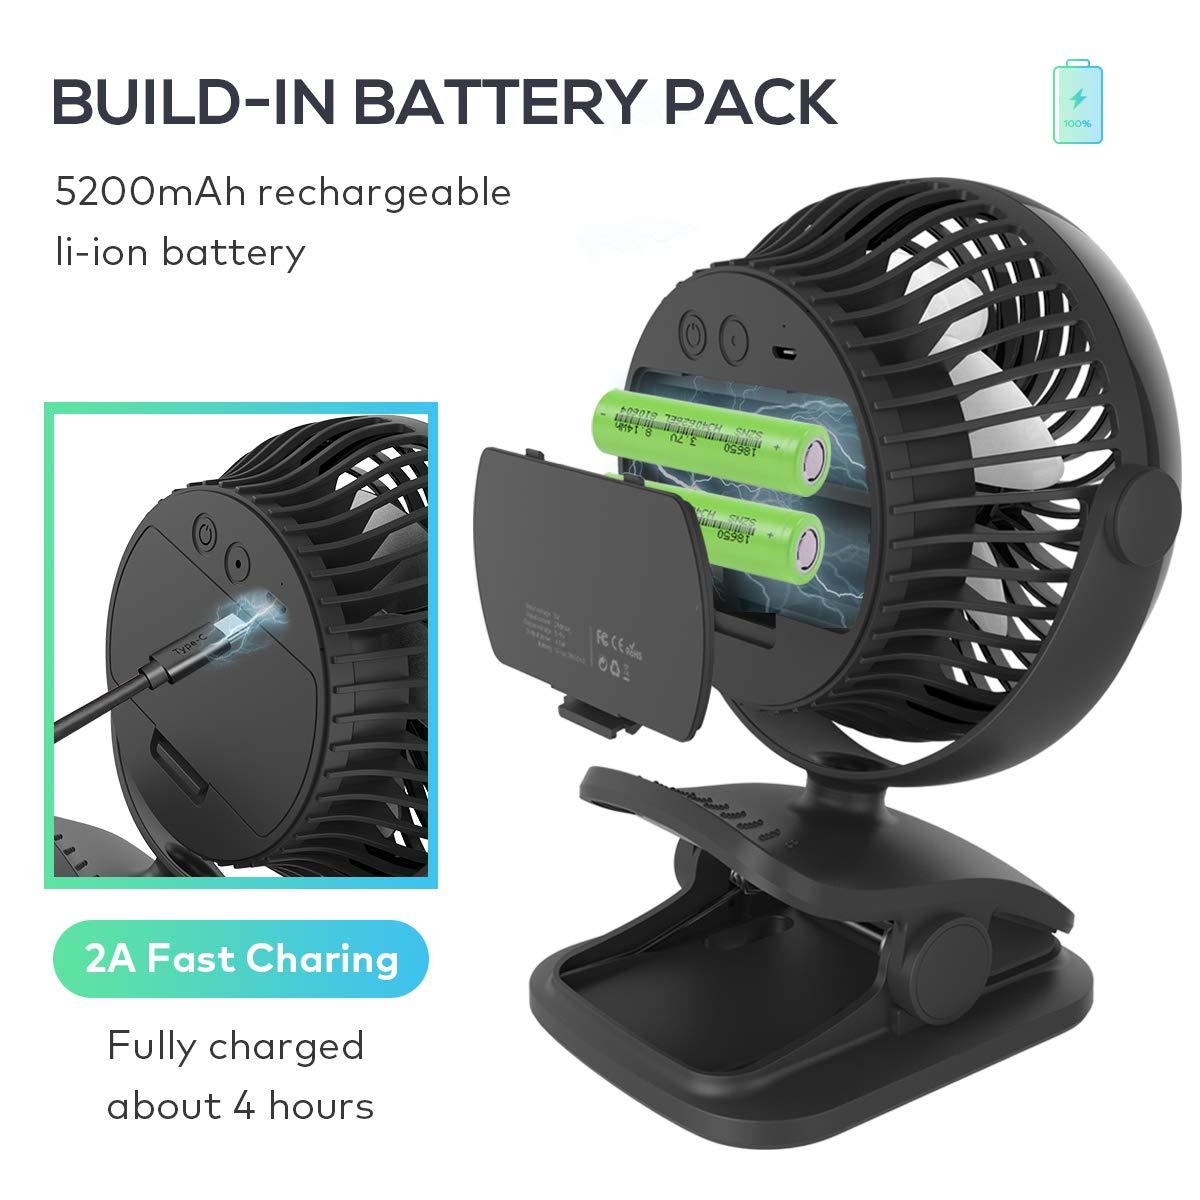 LEMOISTAR Battery Operated Clip on Stroller Fan 5200mAh , Rechargeable Battery USB Powered Desk Fan Small Portable Personal Fan for Baby Stroller, Office, Home, Dorm, Camping etc